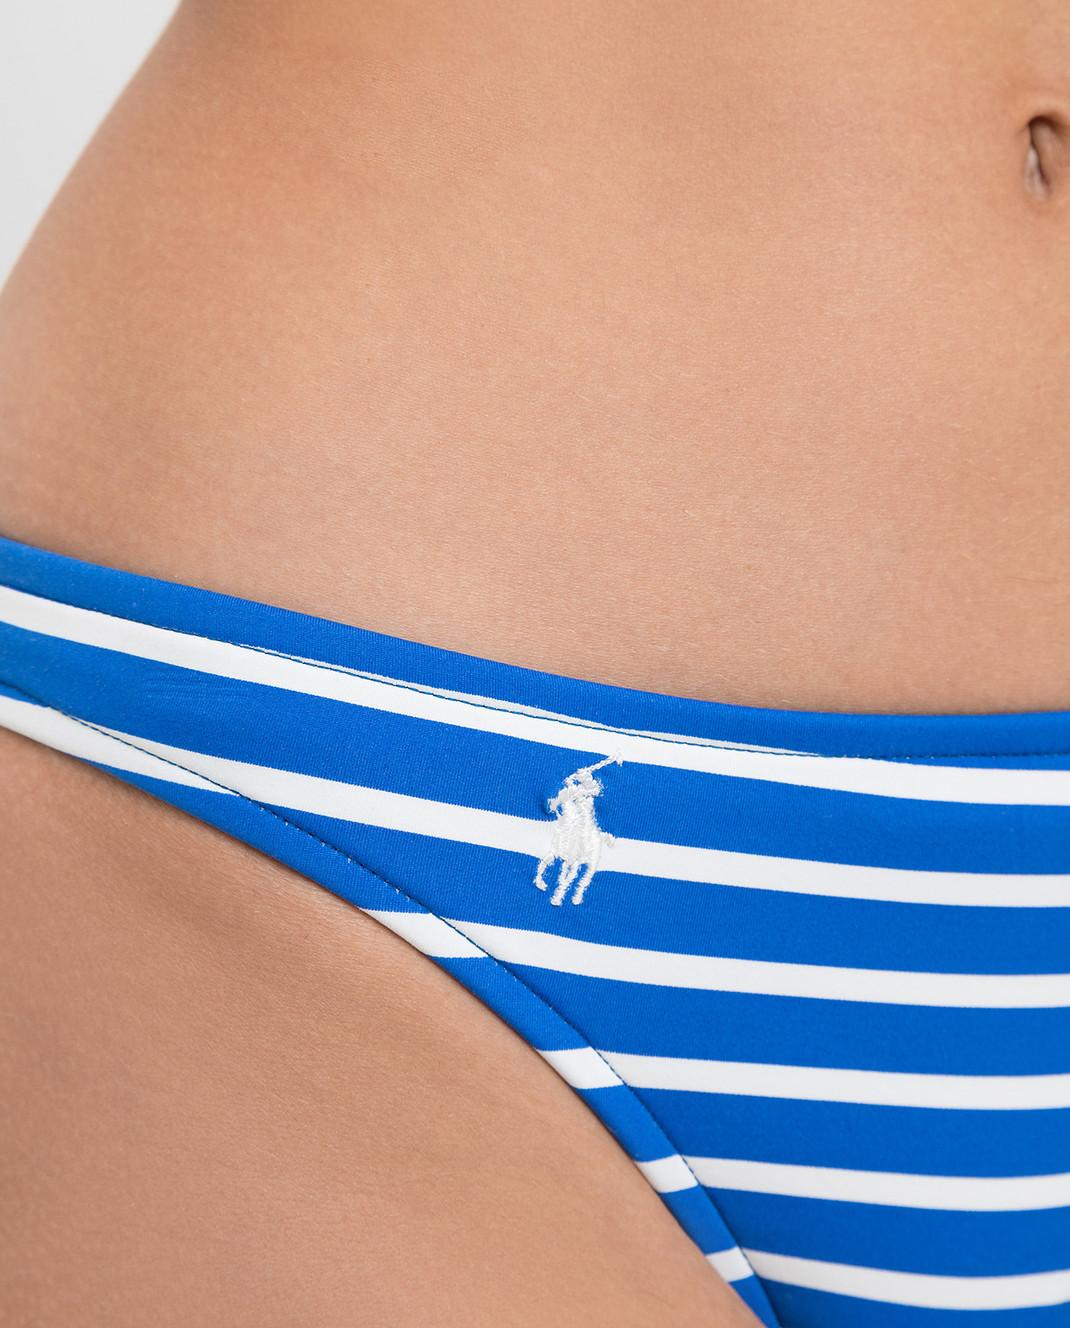 Ralph Lauren Синие трусики от купальника V48IH898 изображение 5